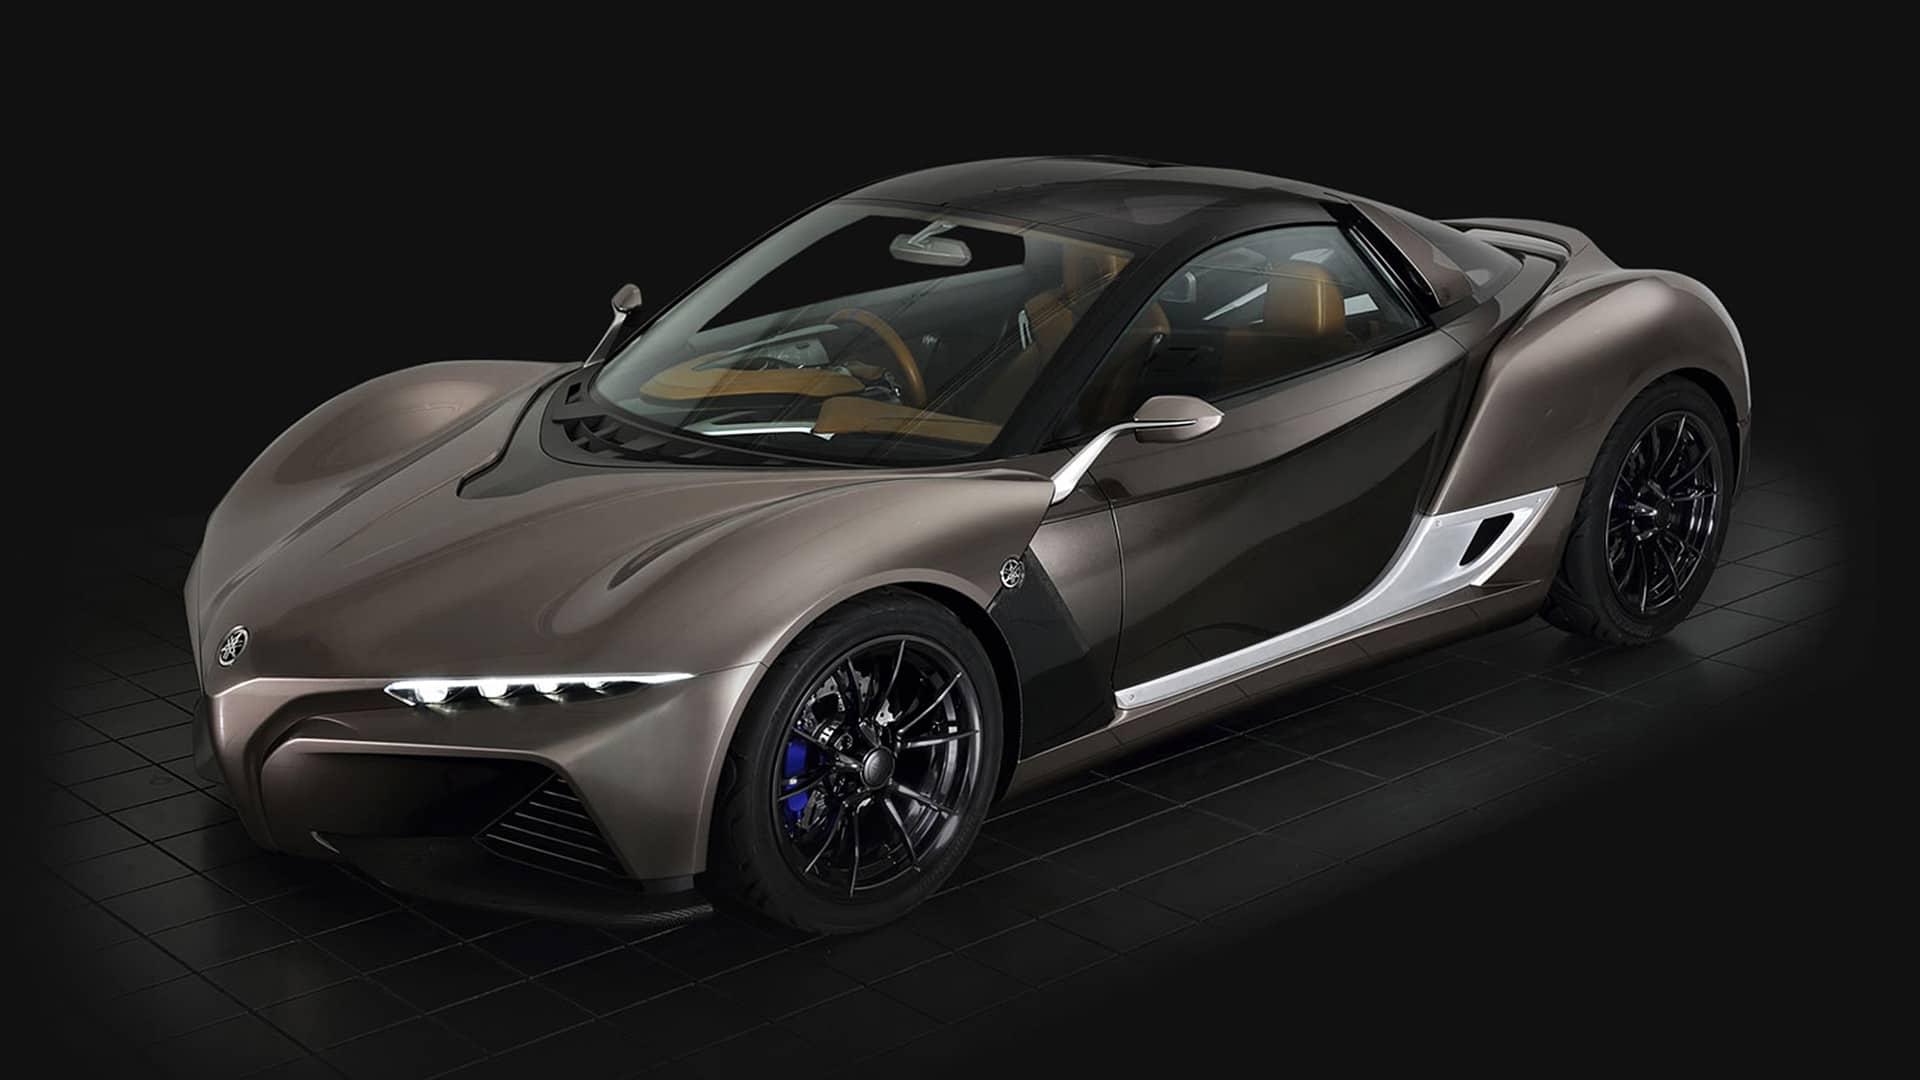 Yamaha Sports Ride Concept car